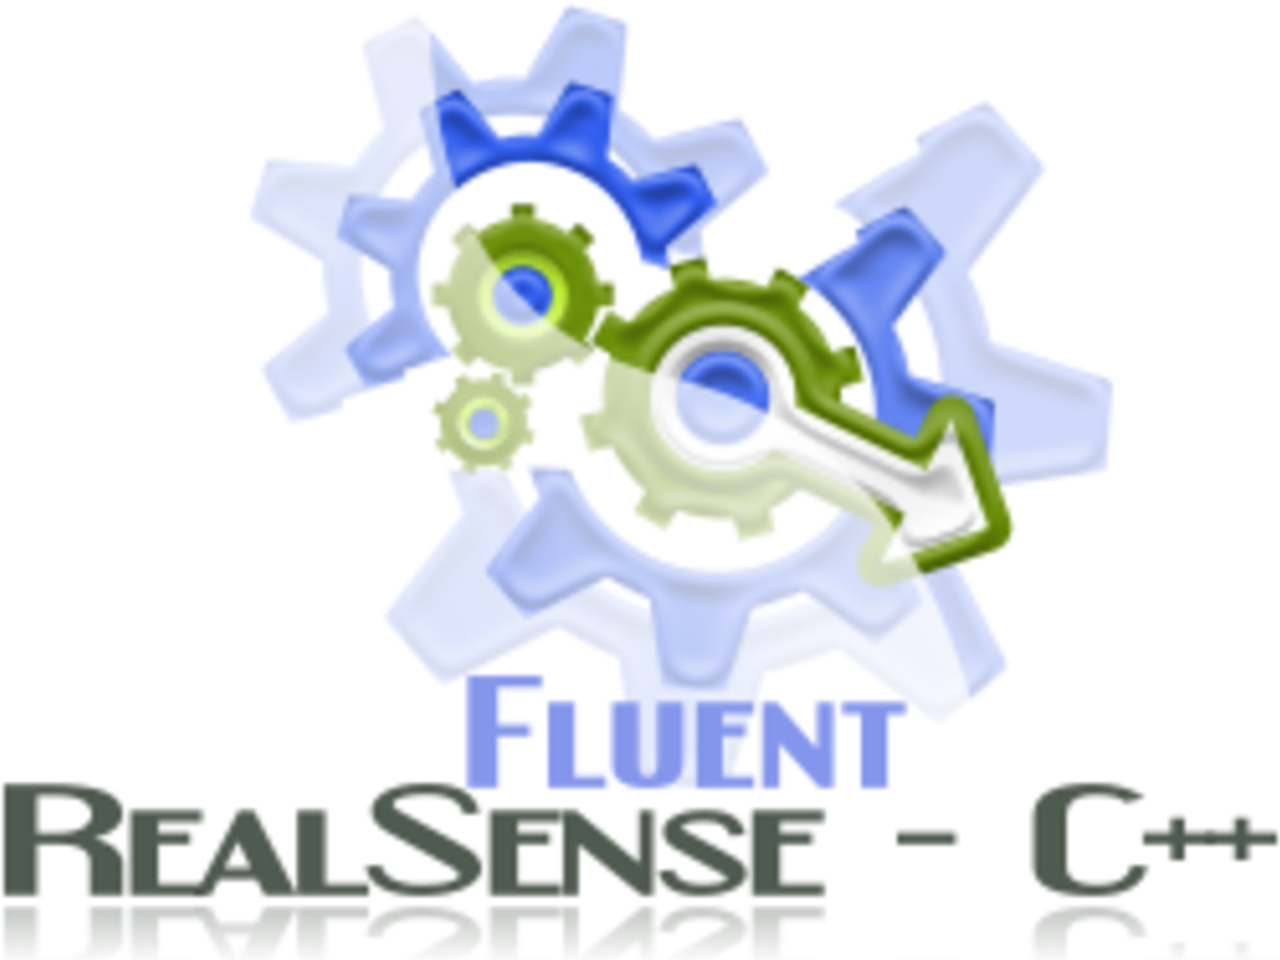 Fluent RealSense